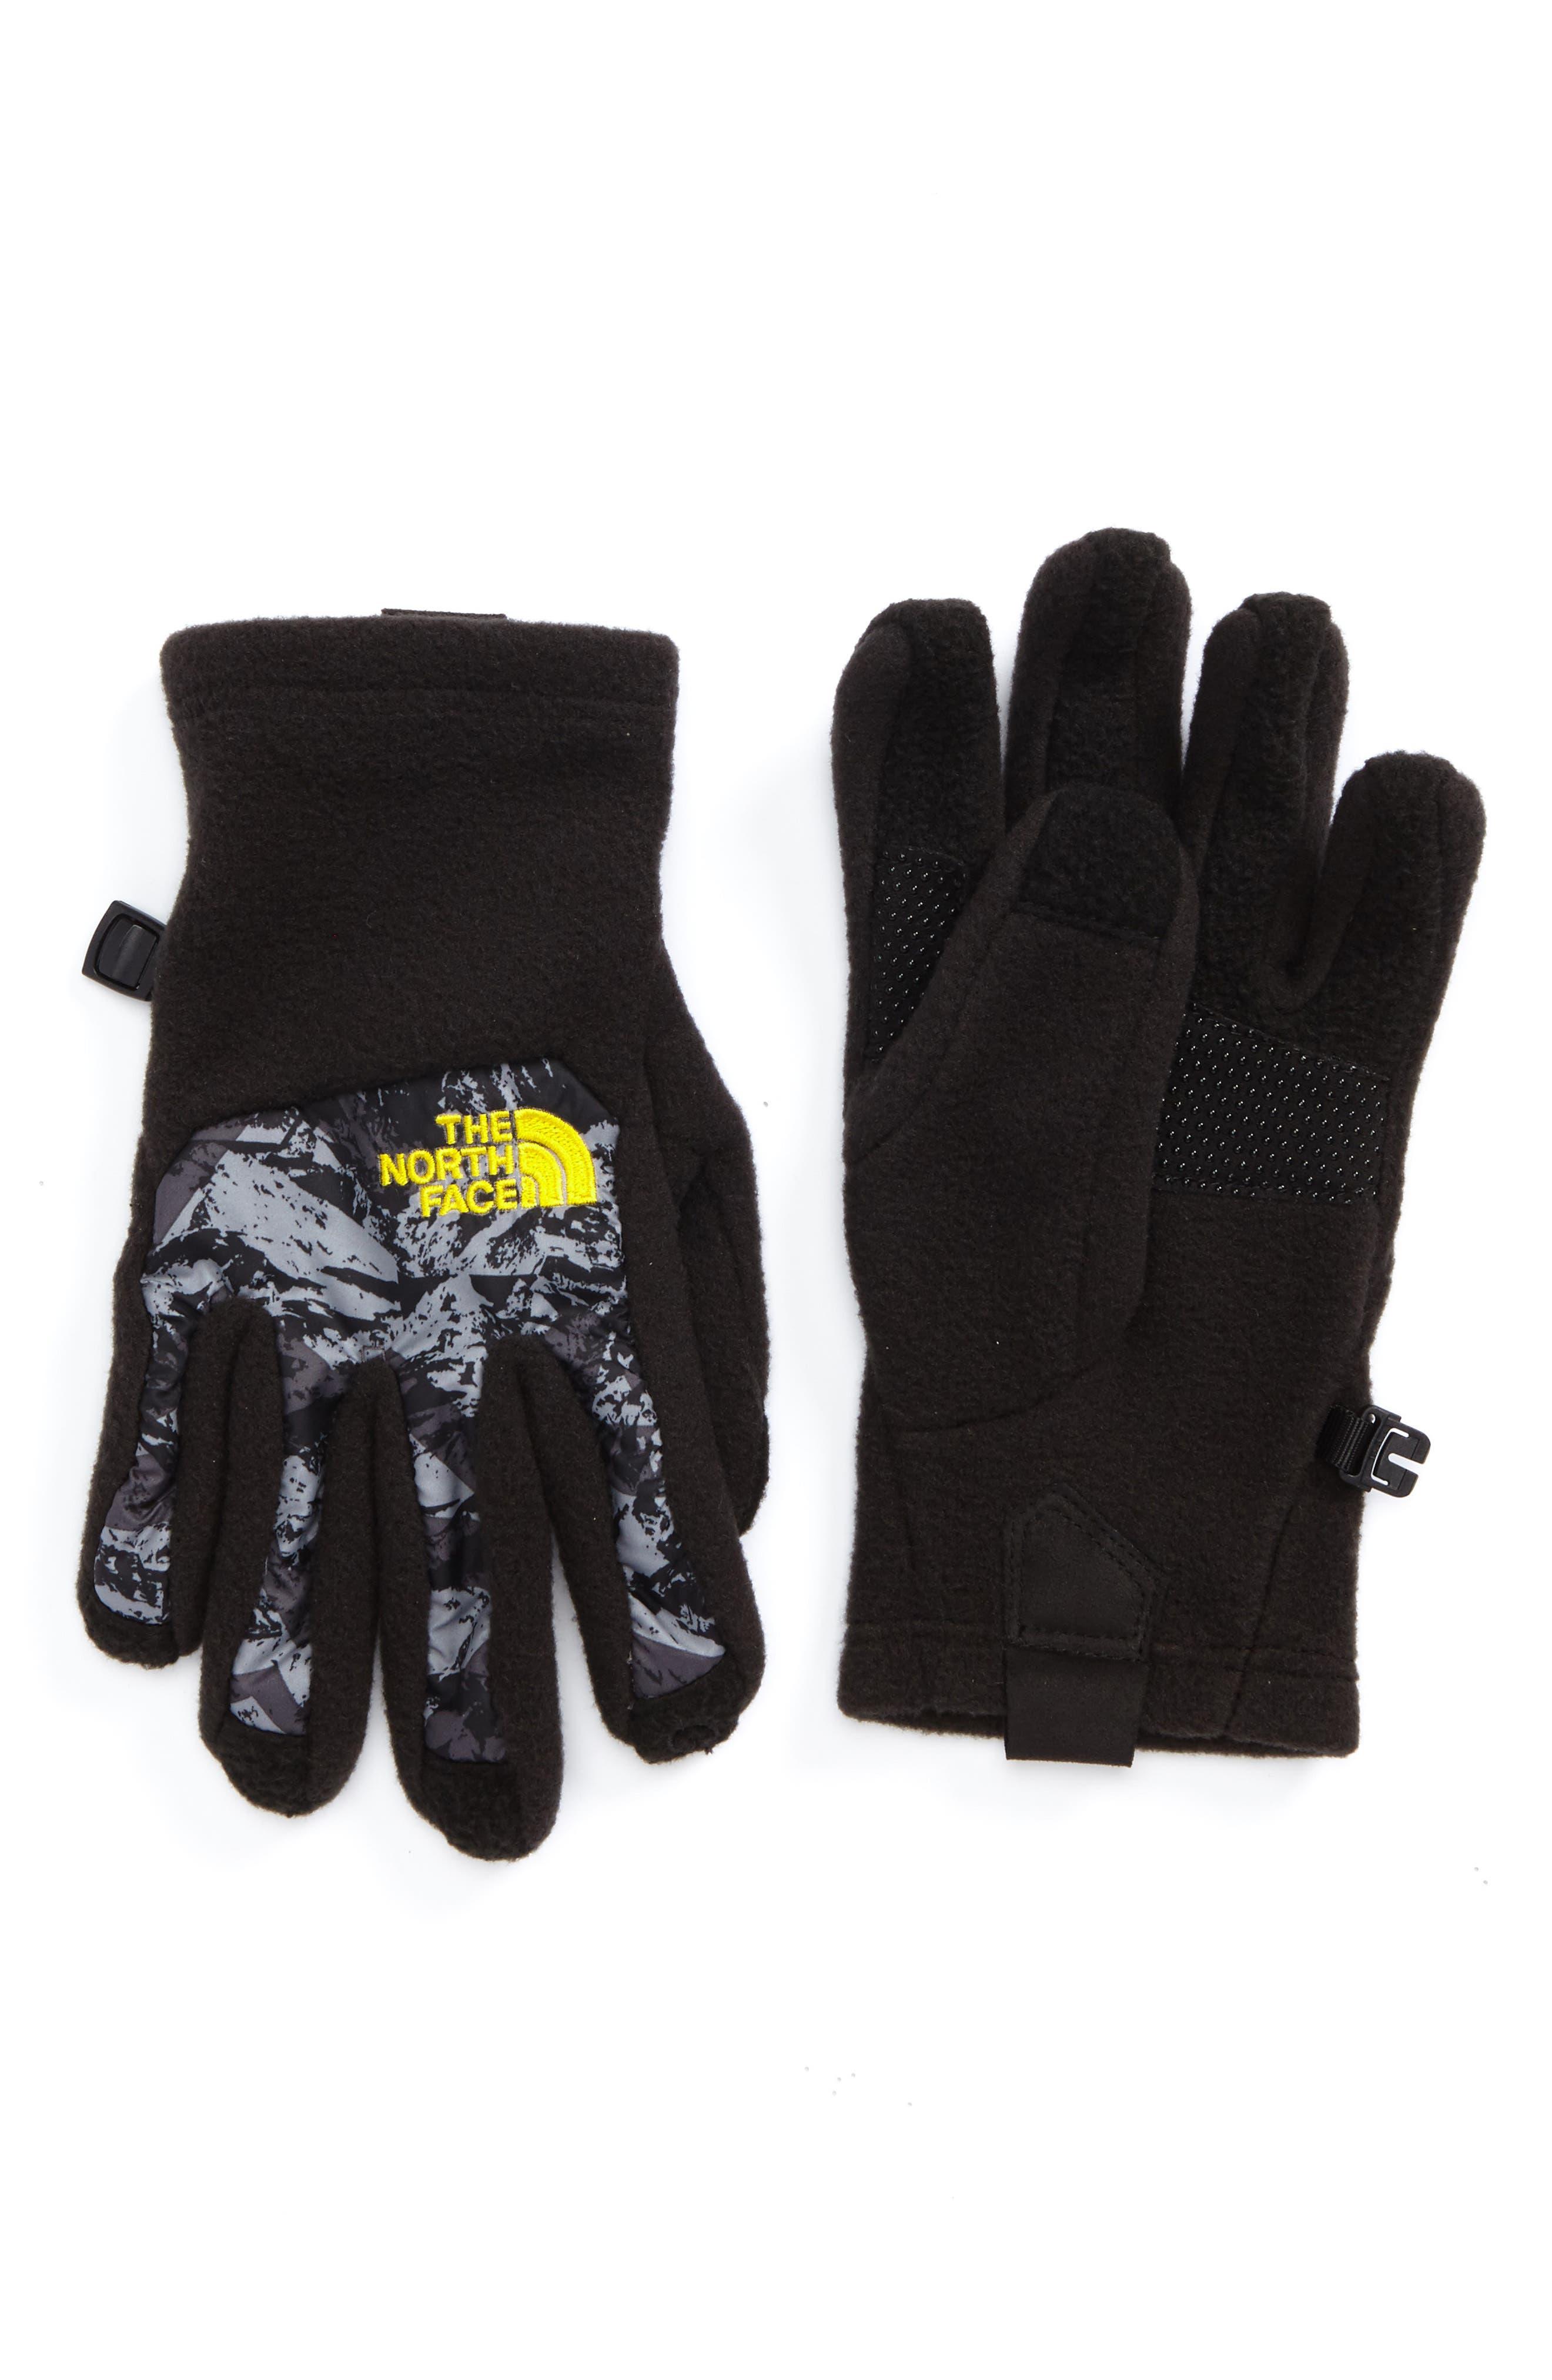 Alternate Image 1 Selected - The North Face Denali Etip™ Gloves (Kids)